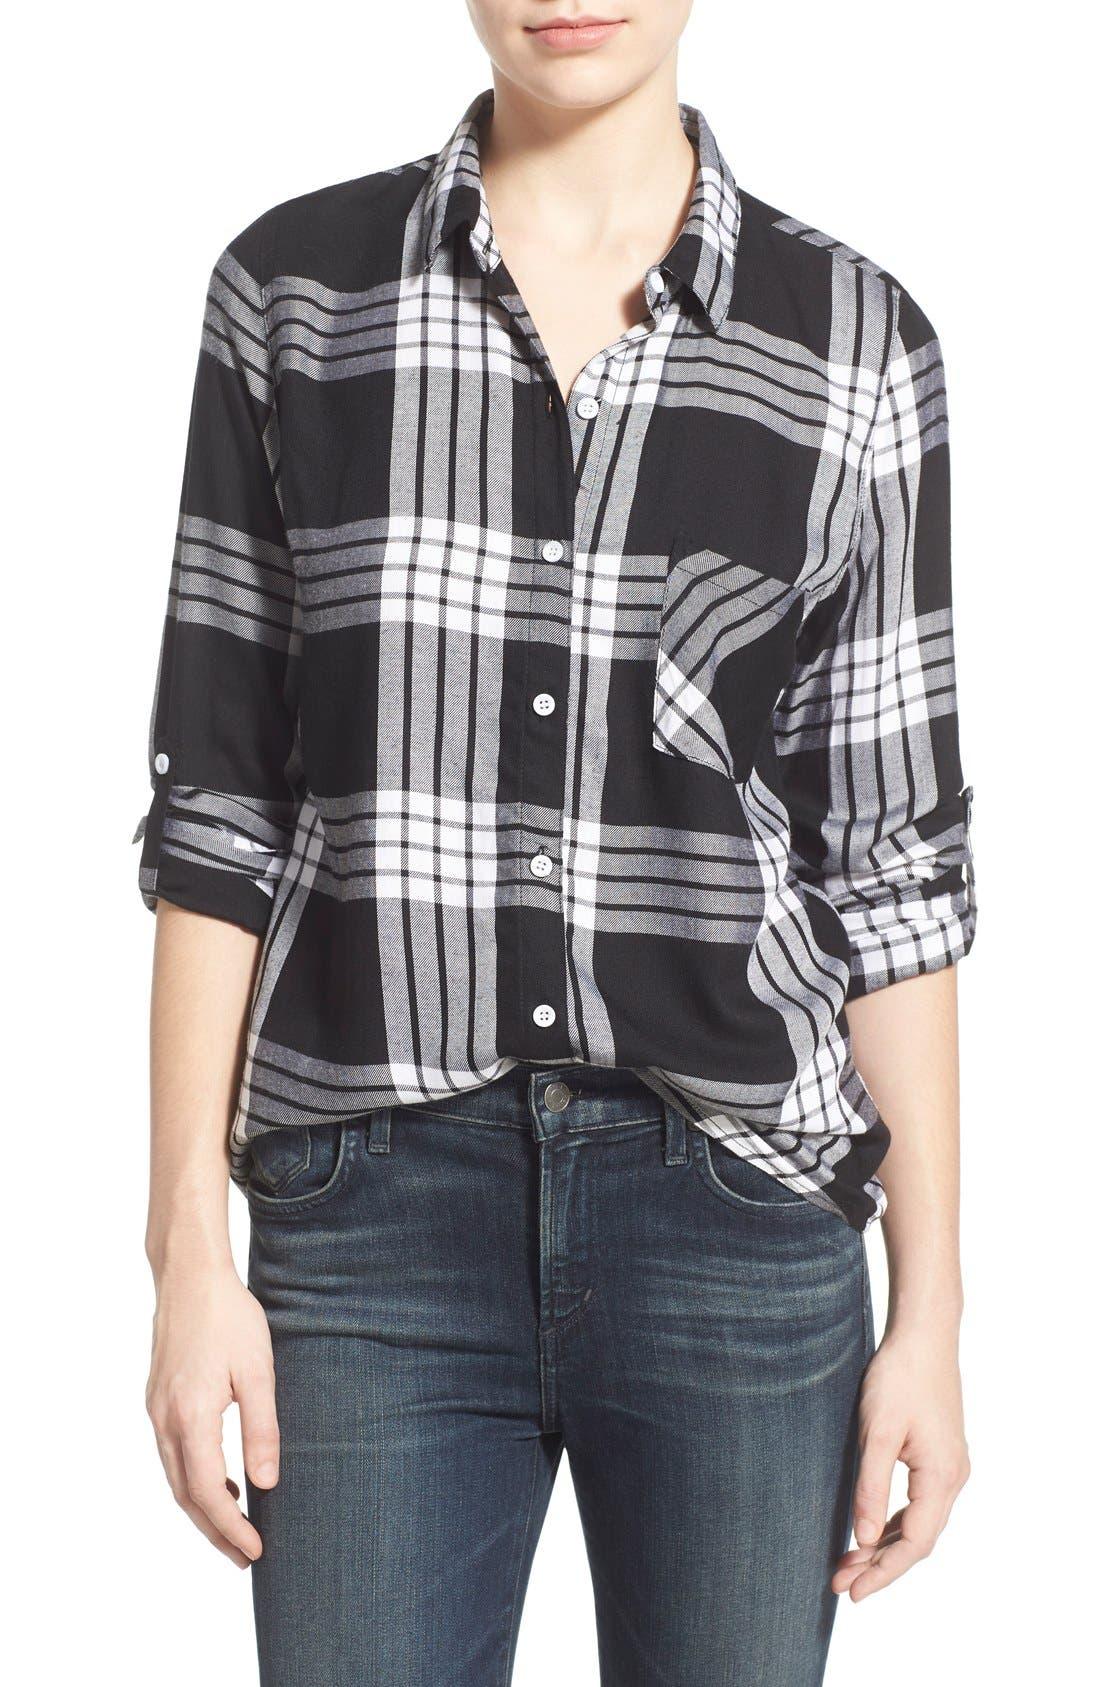 Alternate Image 1 Selected - Thread & Supply 'Denver' Plaid Shirt